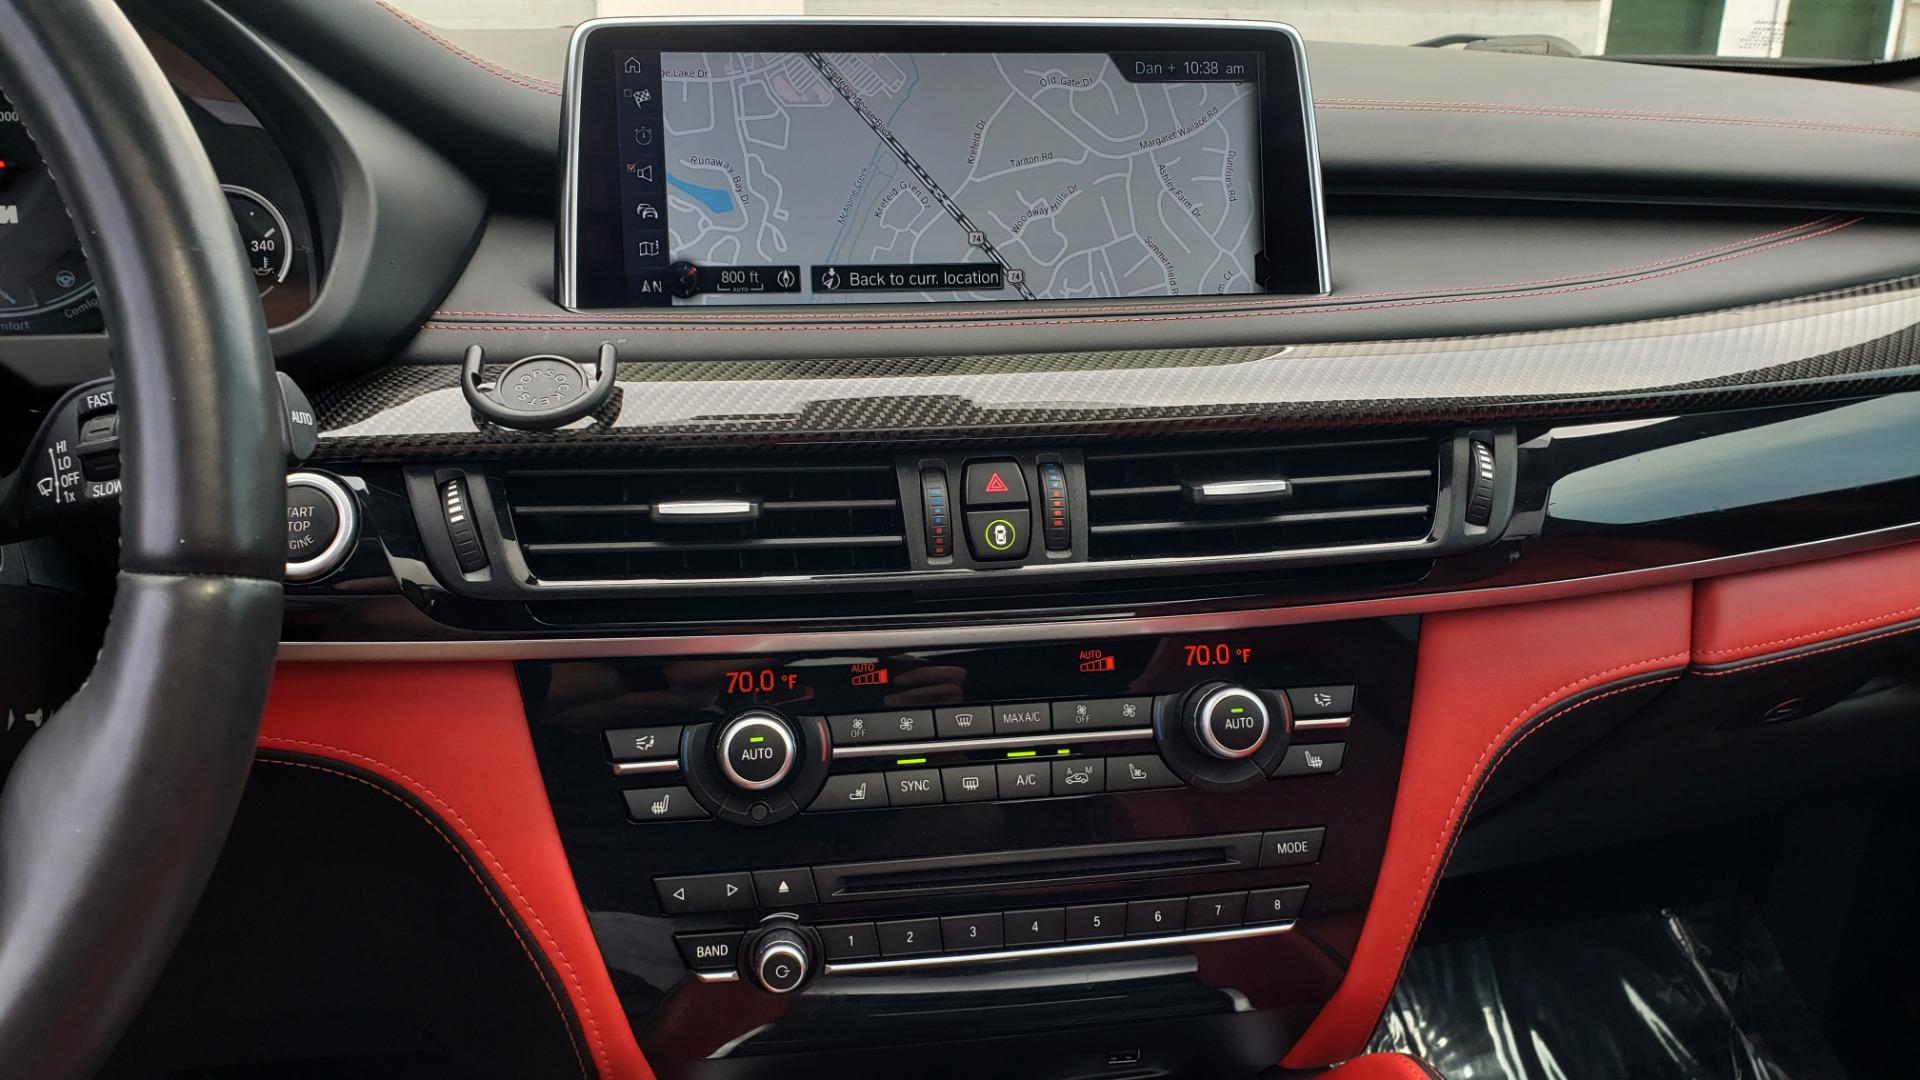 Used 2017 BMW X5 M EXECUTIVE PKG / NAV / DRVR ASST / BSM / HUD / HTD STS / WIFI for sale Sold at Formula Imports in Charlotte NC 28227 46